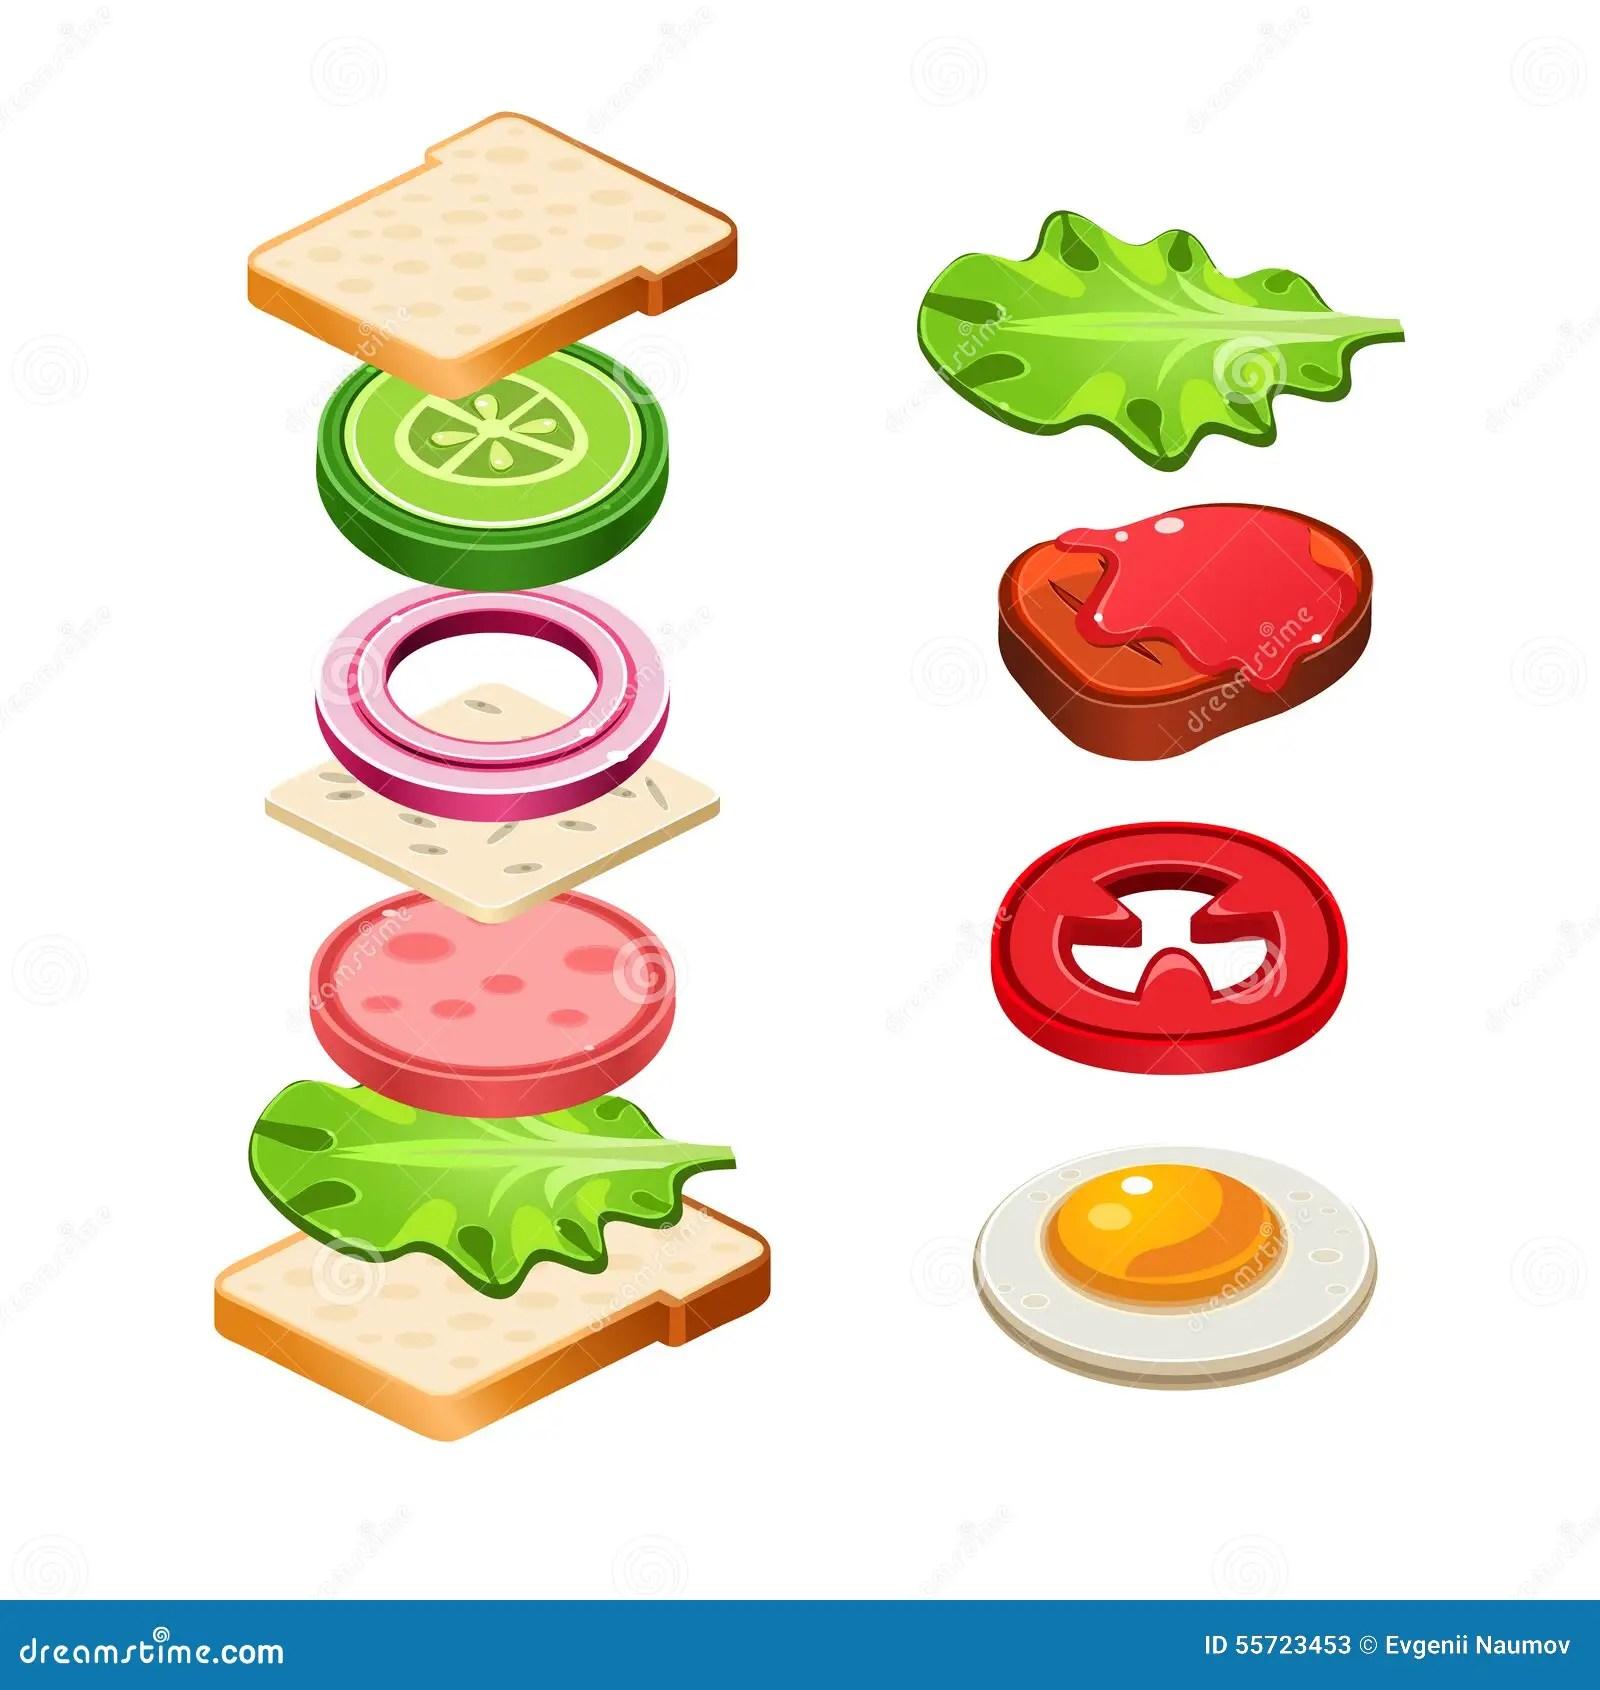 Sandwich Ingre Nts Food Illustration Royalty Free